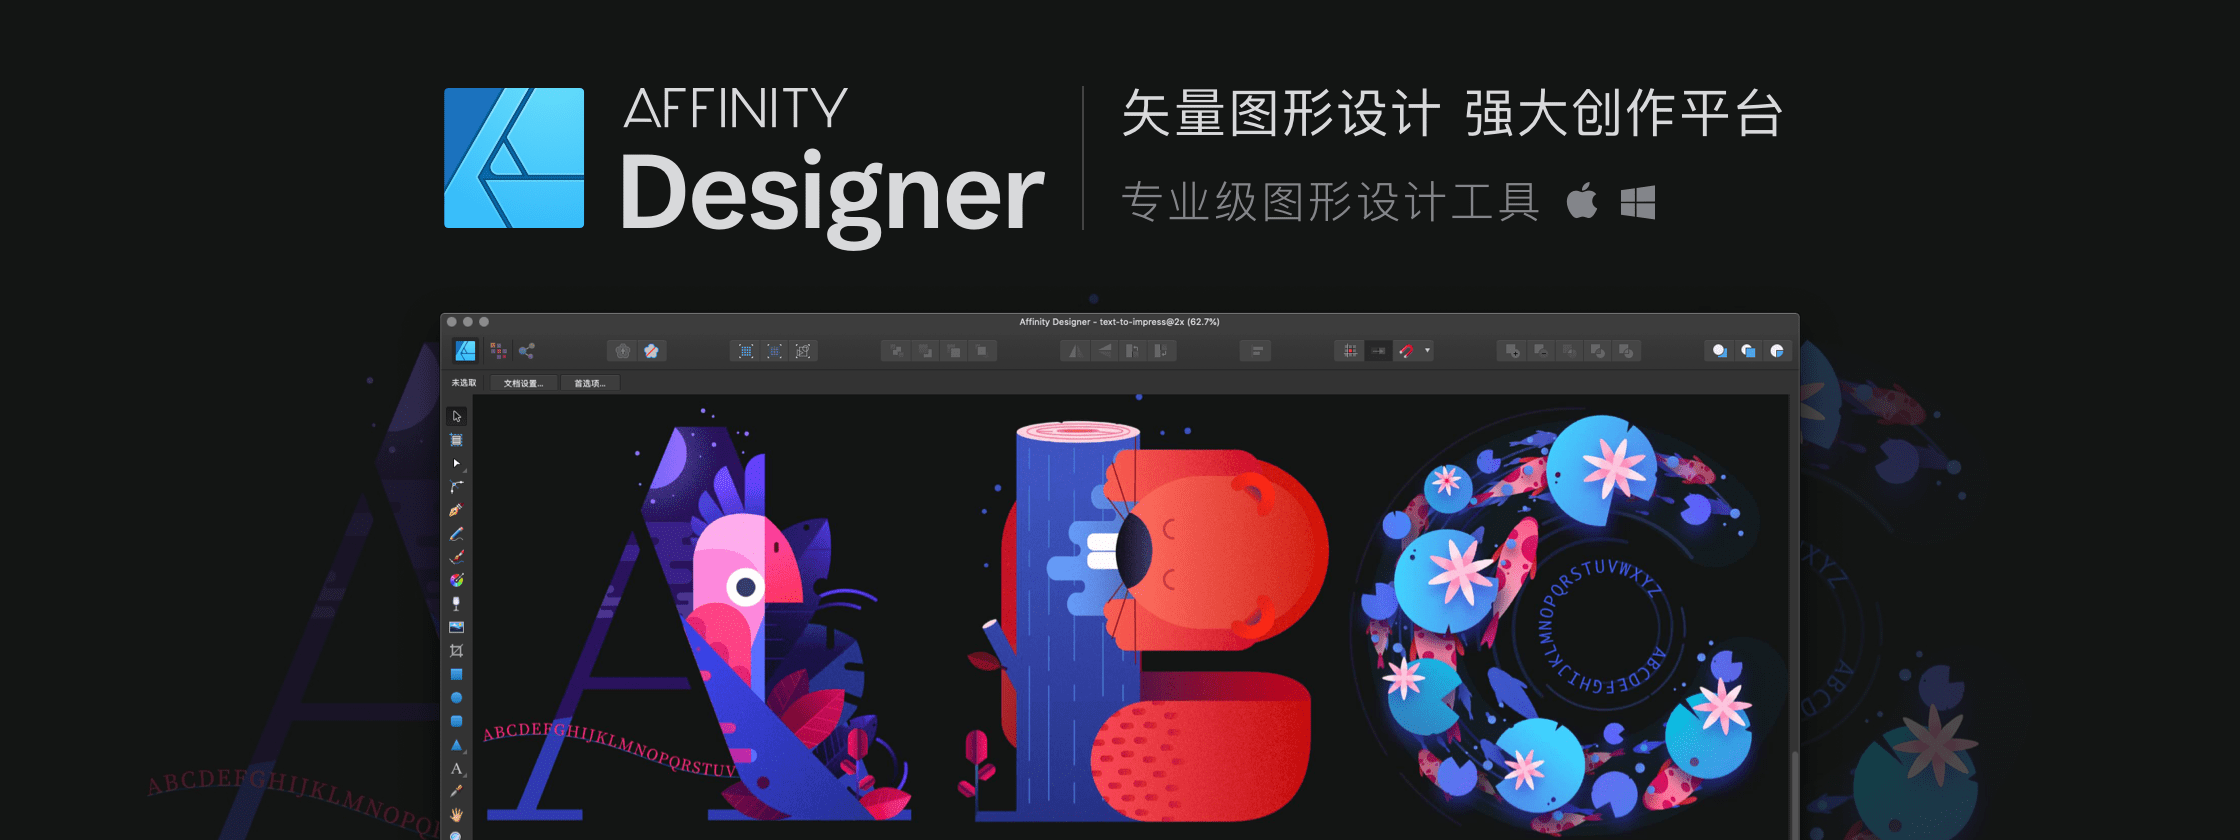 Affinity Designer  – 强大矢量图设计工具